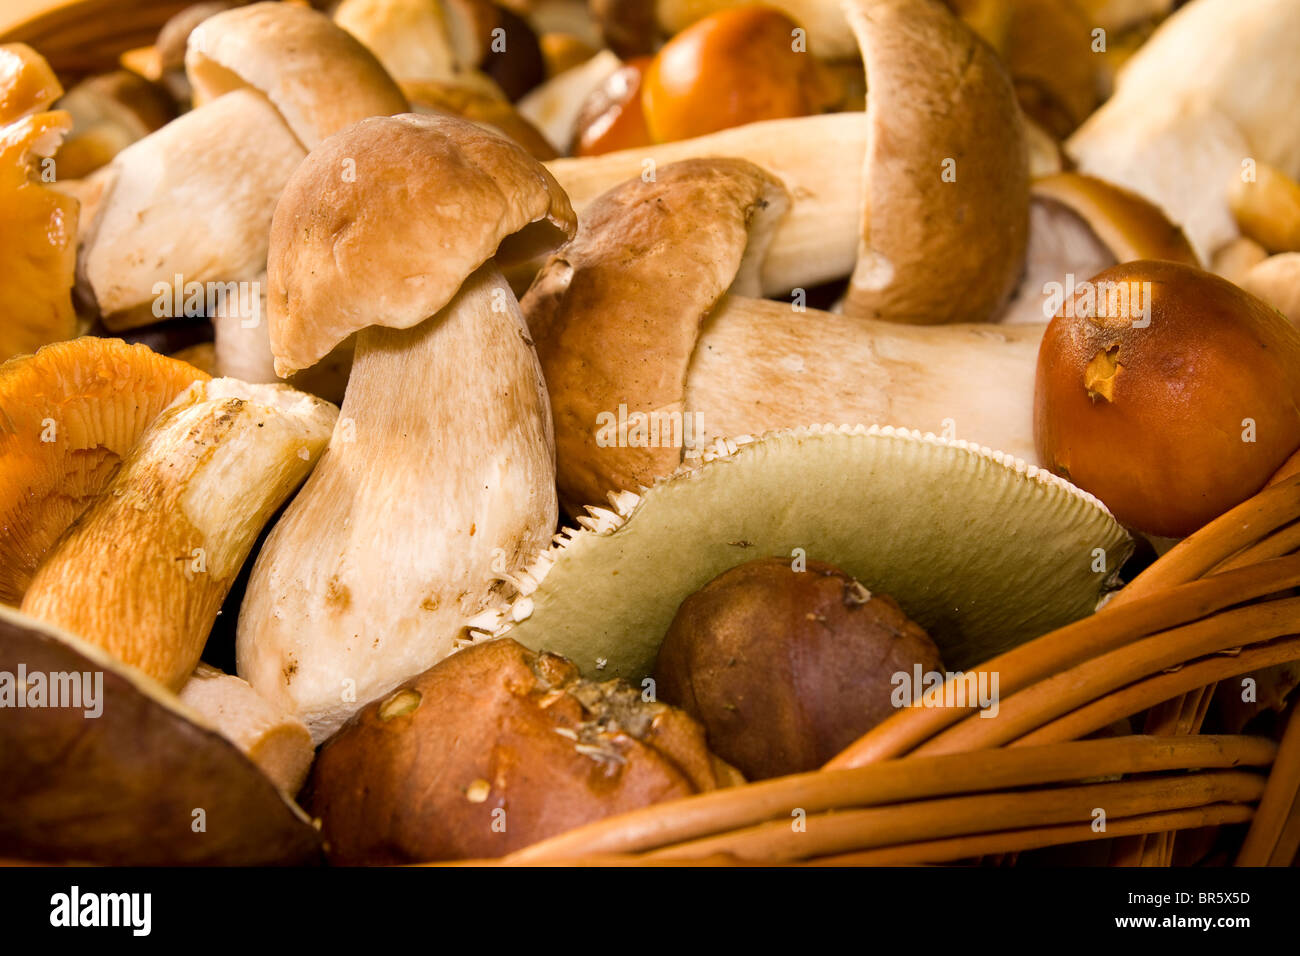 Basket with edible mushrooms. Fungus. - Stock Image